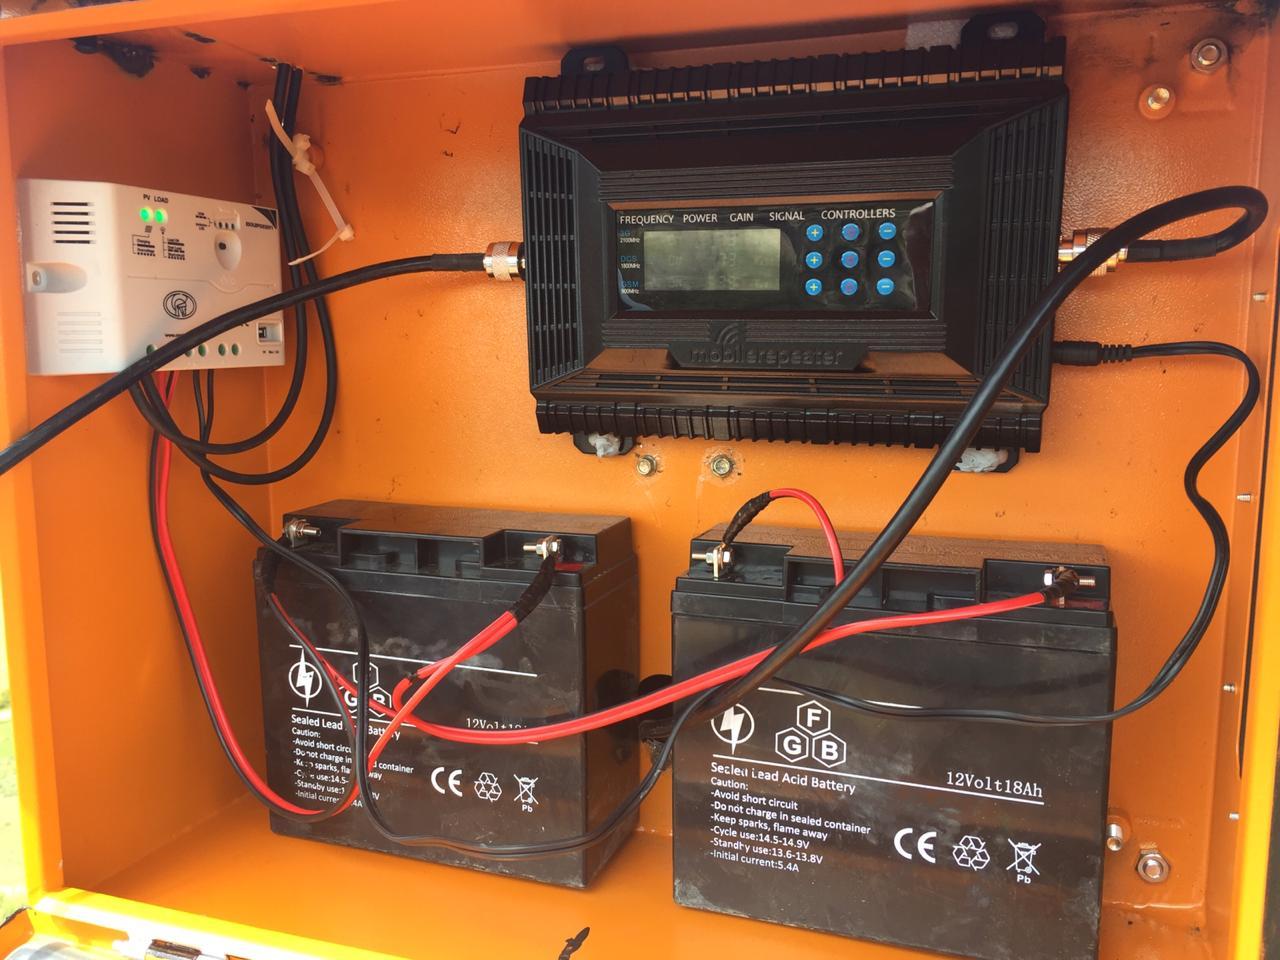 Outdoor Signal Booster Installs 6